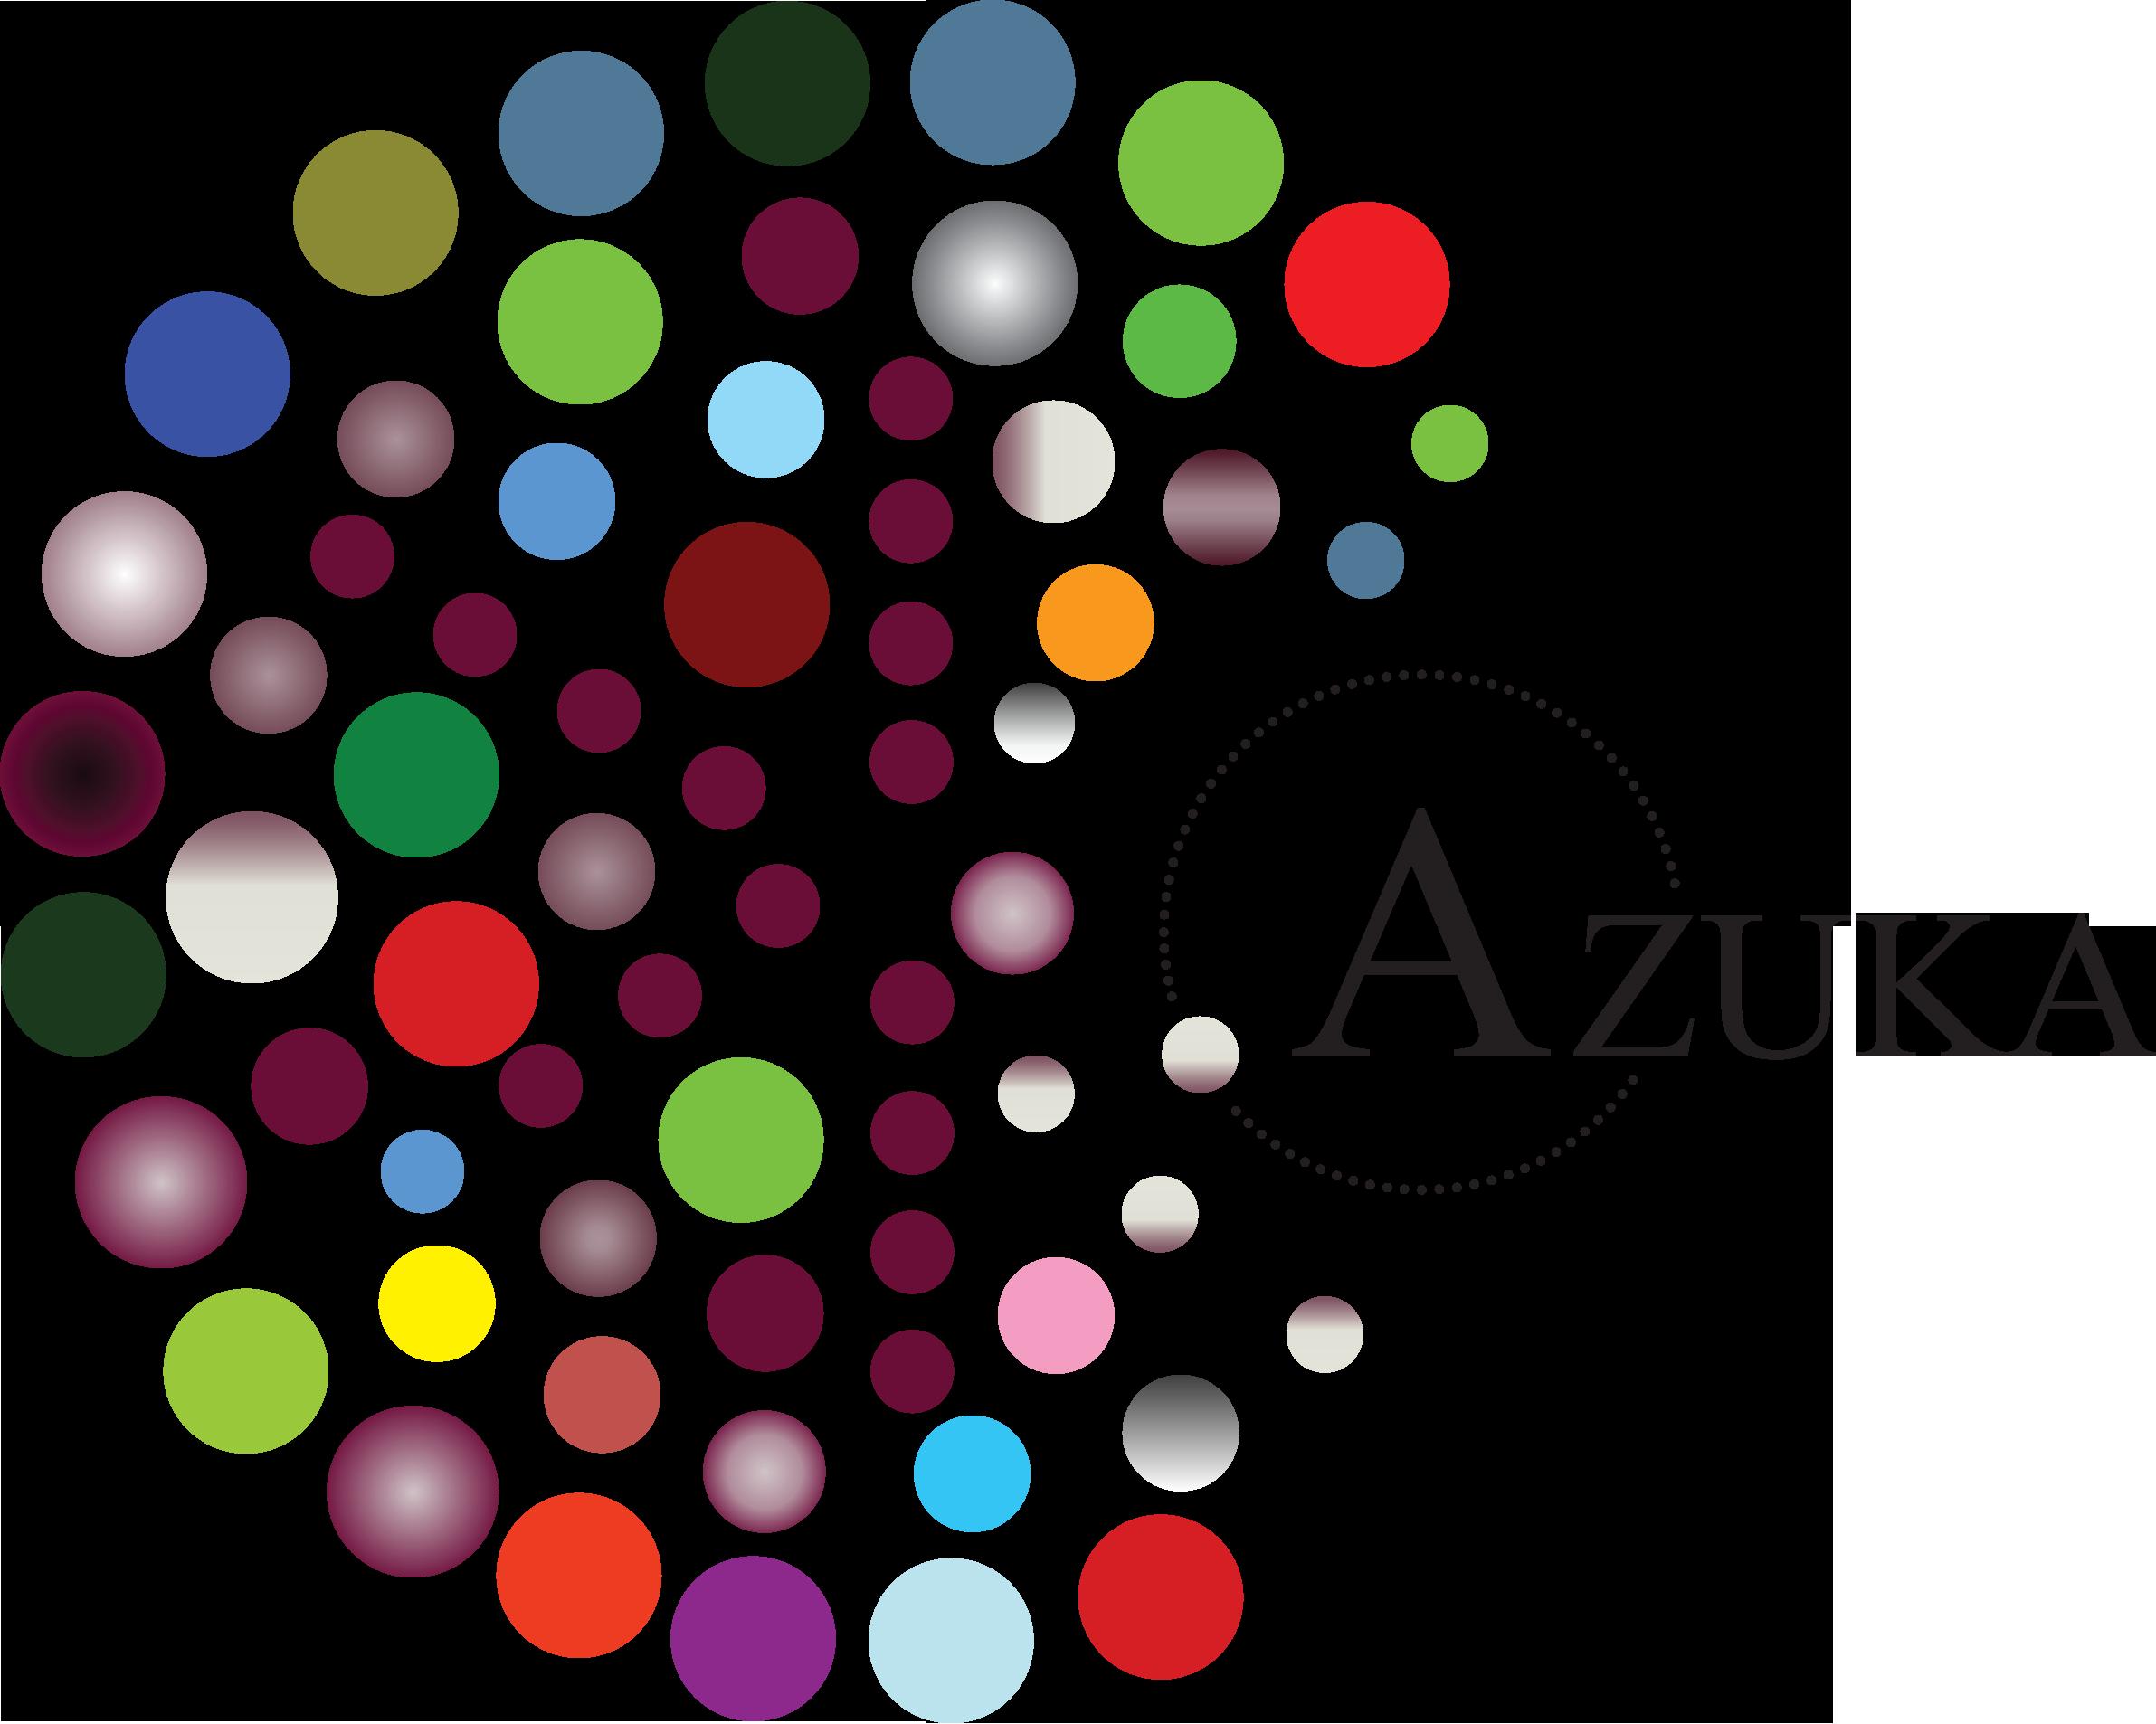 AZUKA_SQUARE_BLK